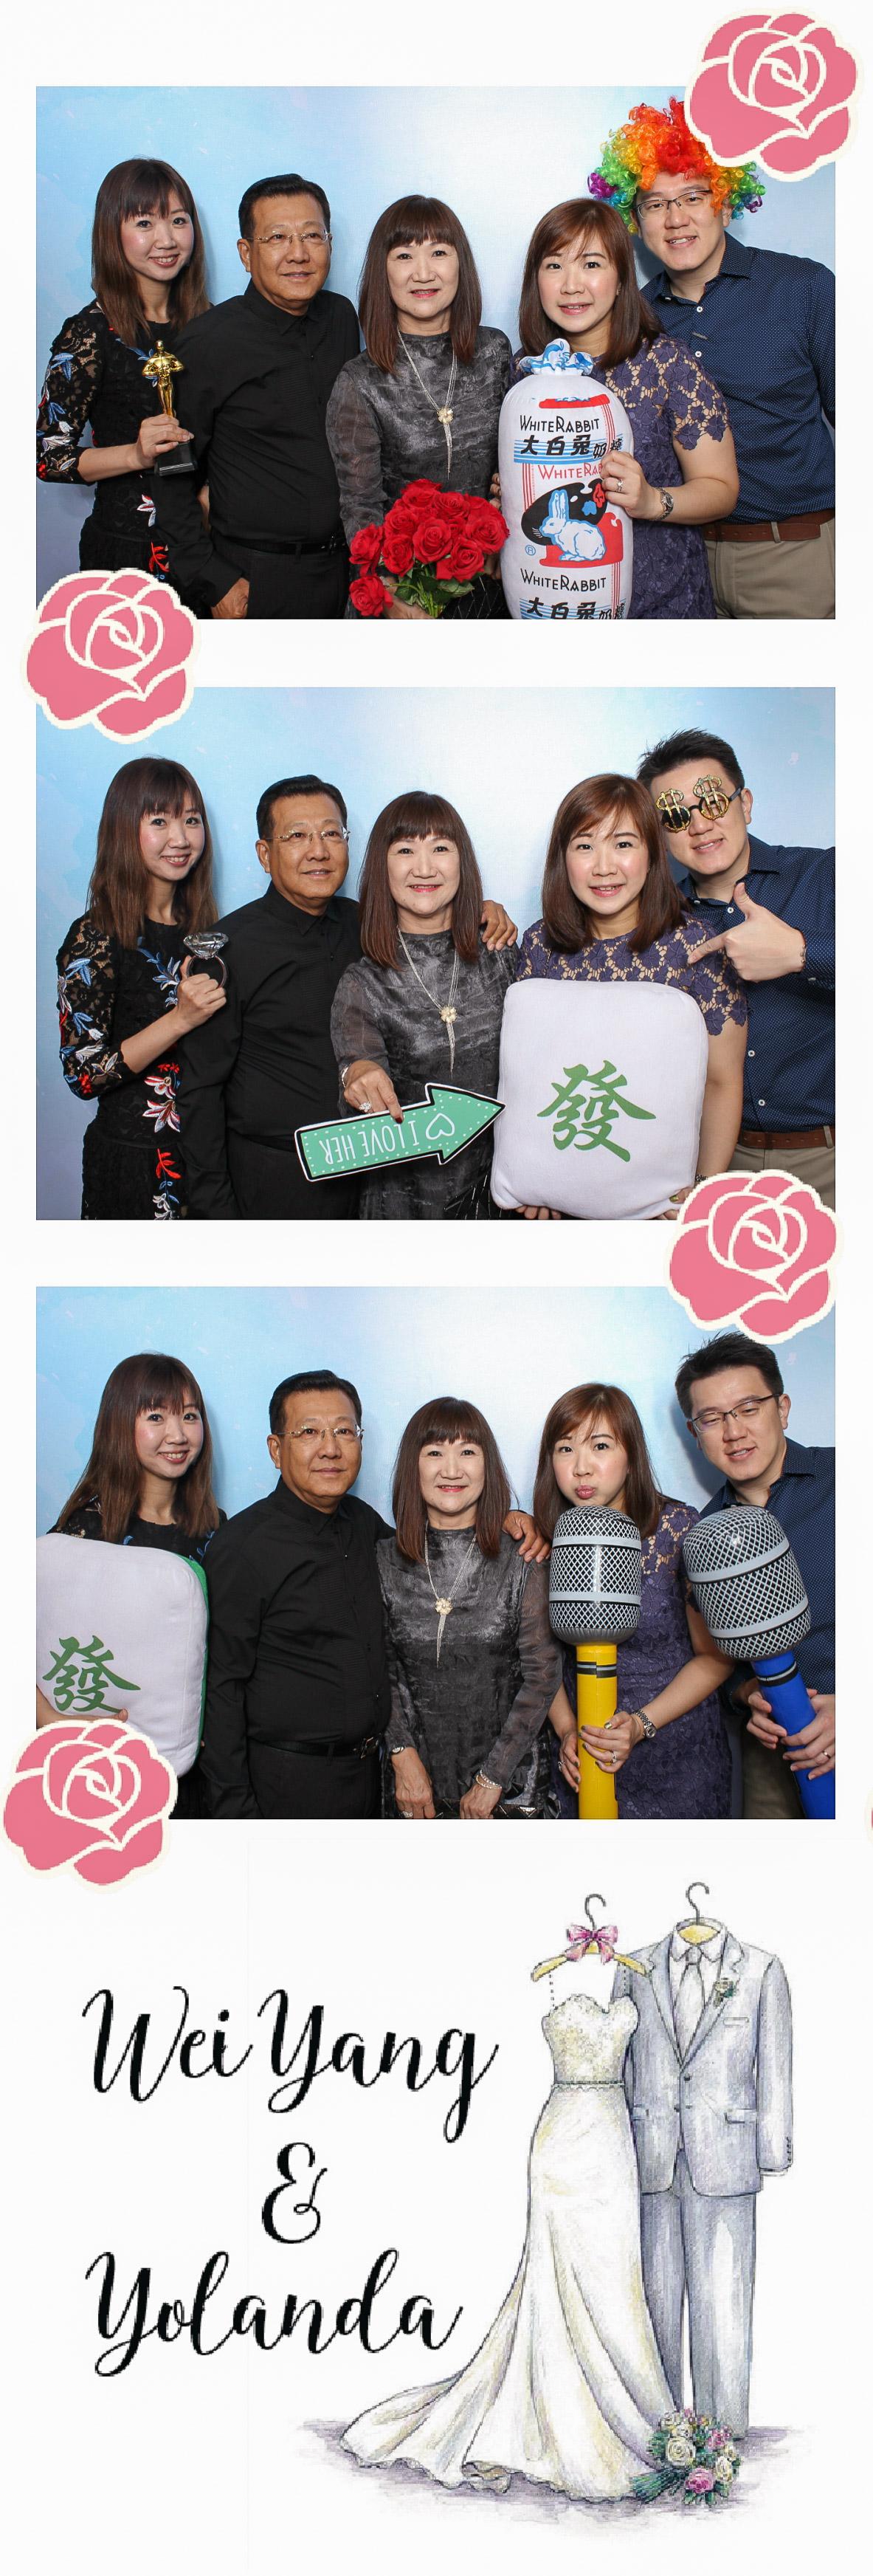 Photobooth 1706-5